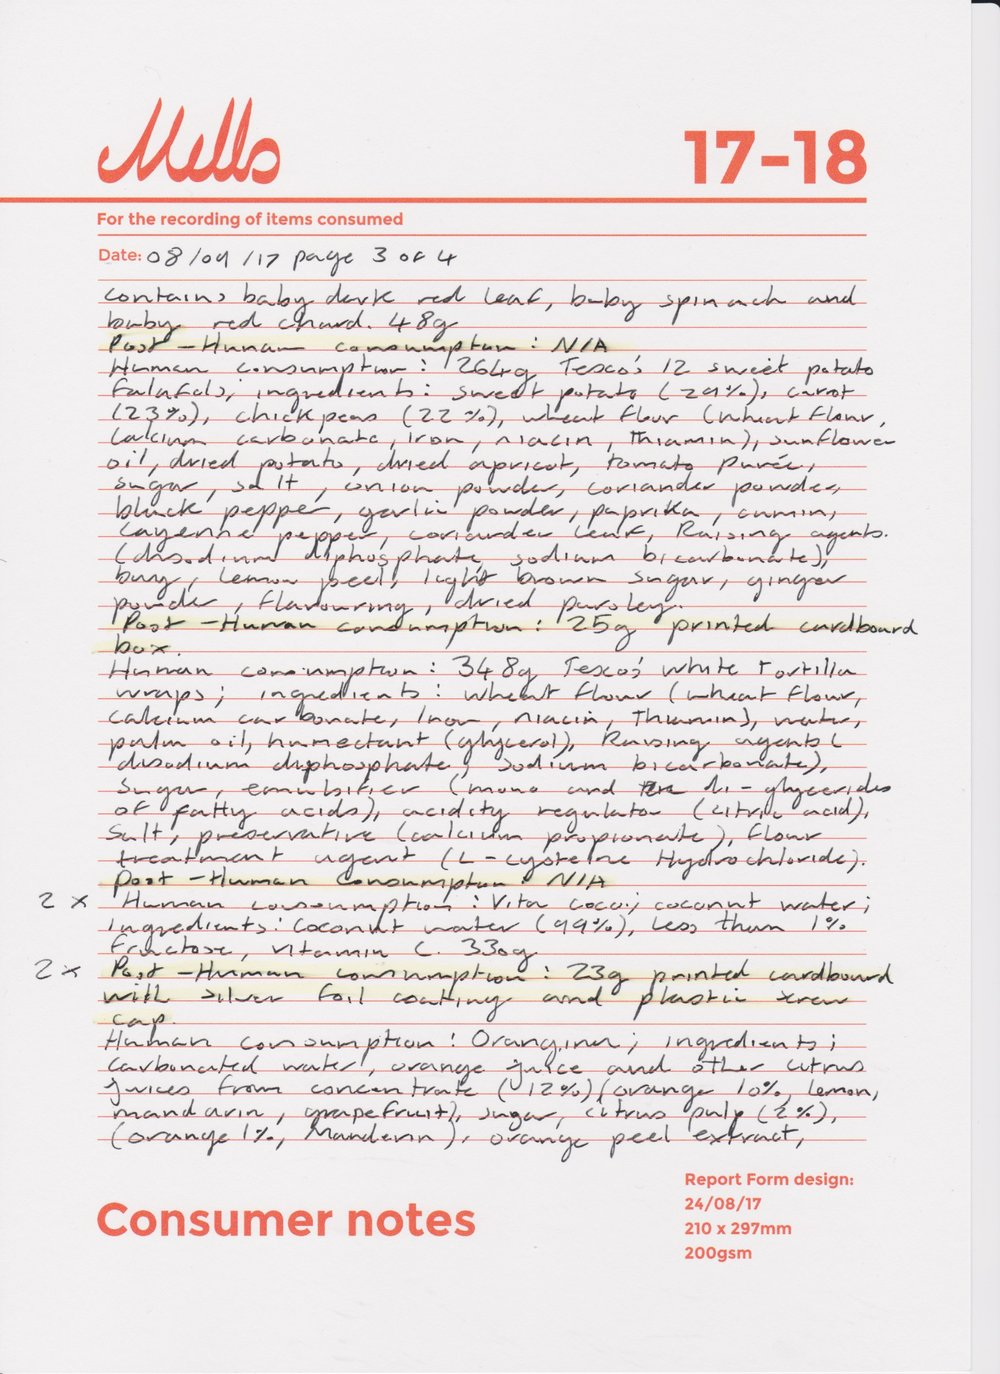 Steven Mills Consumer notes 080917 pg3 of 4.jpeg